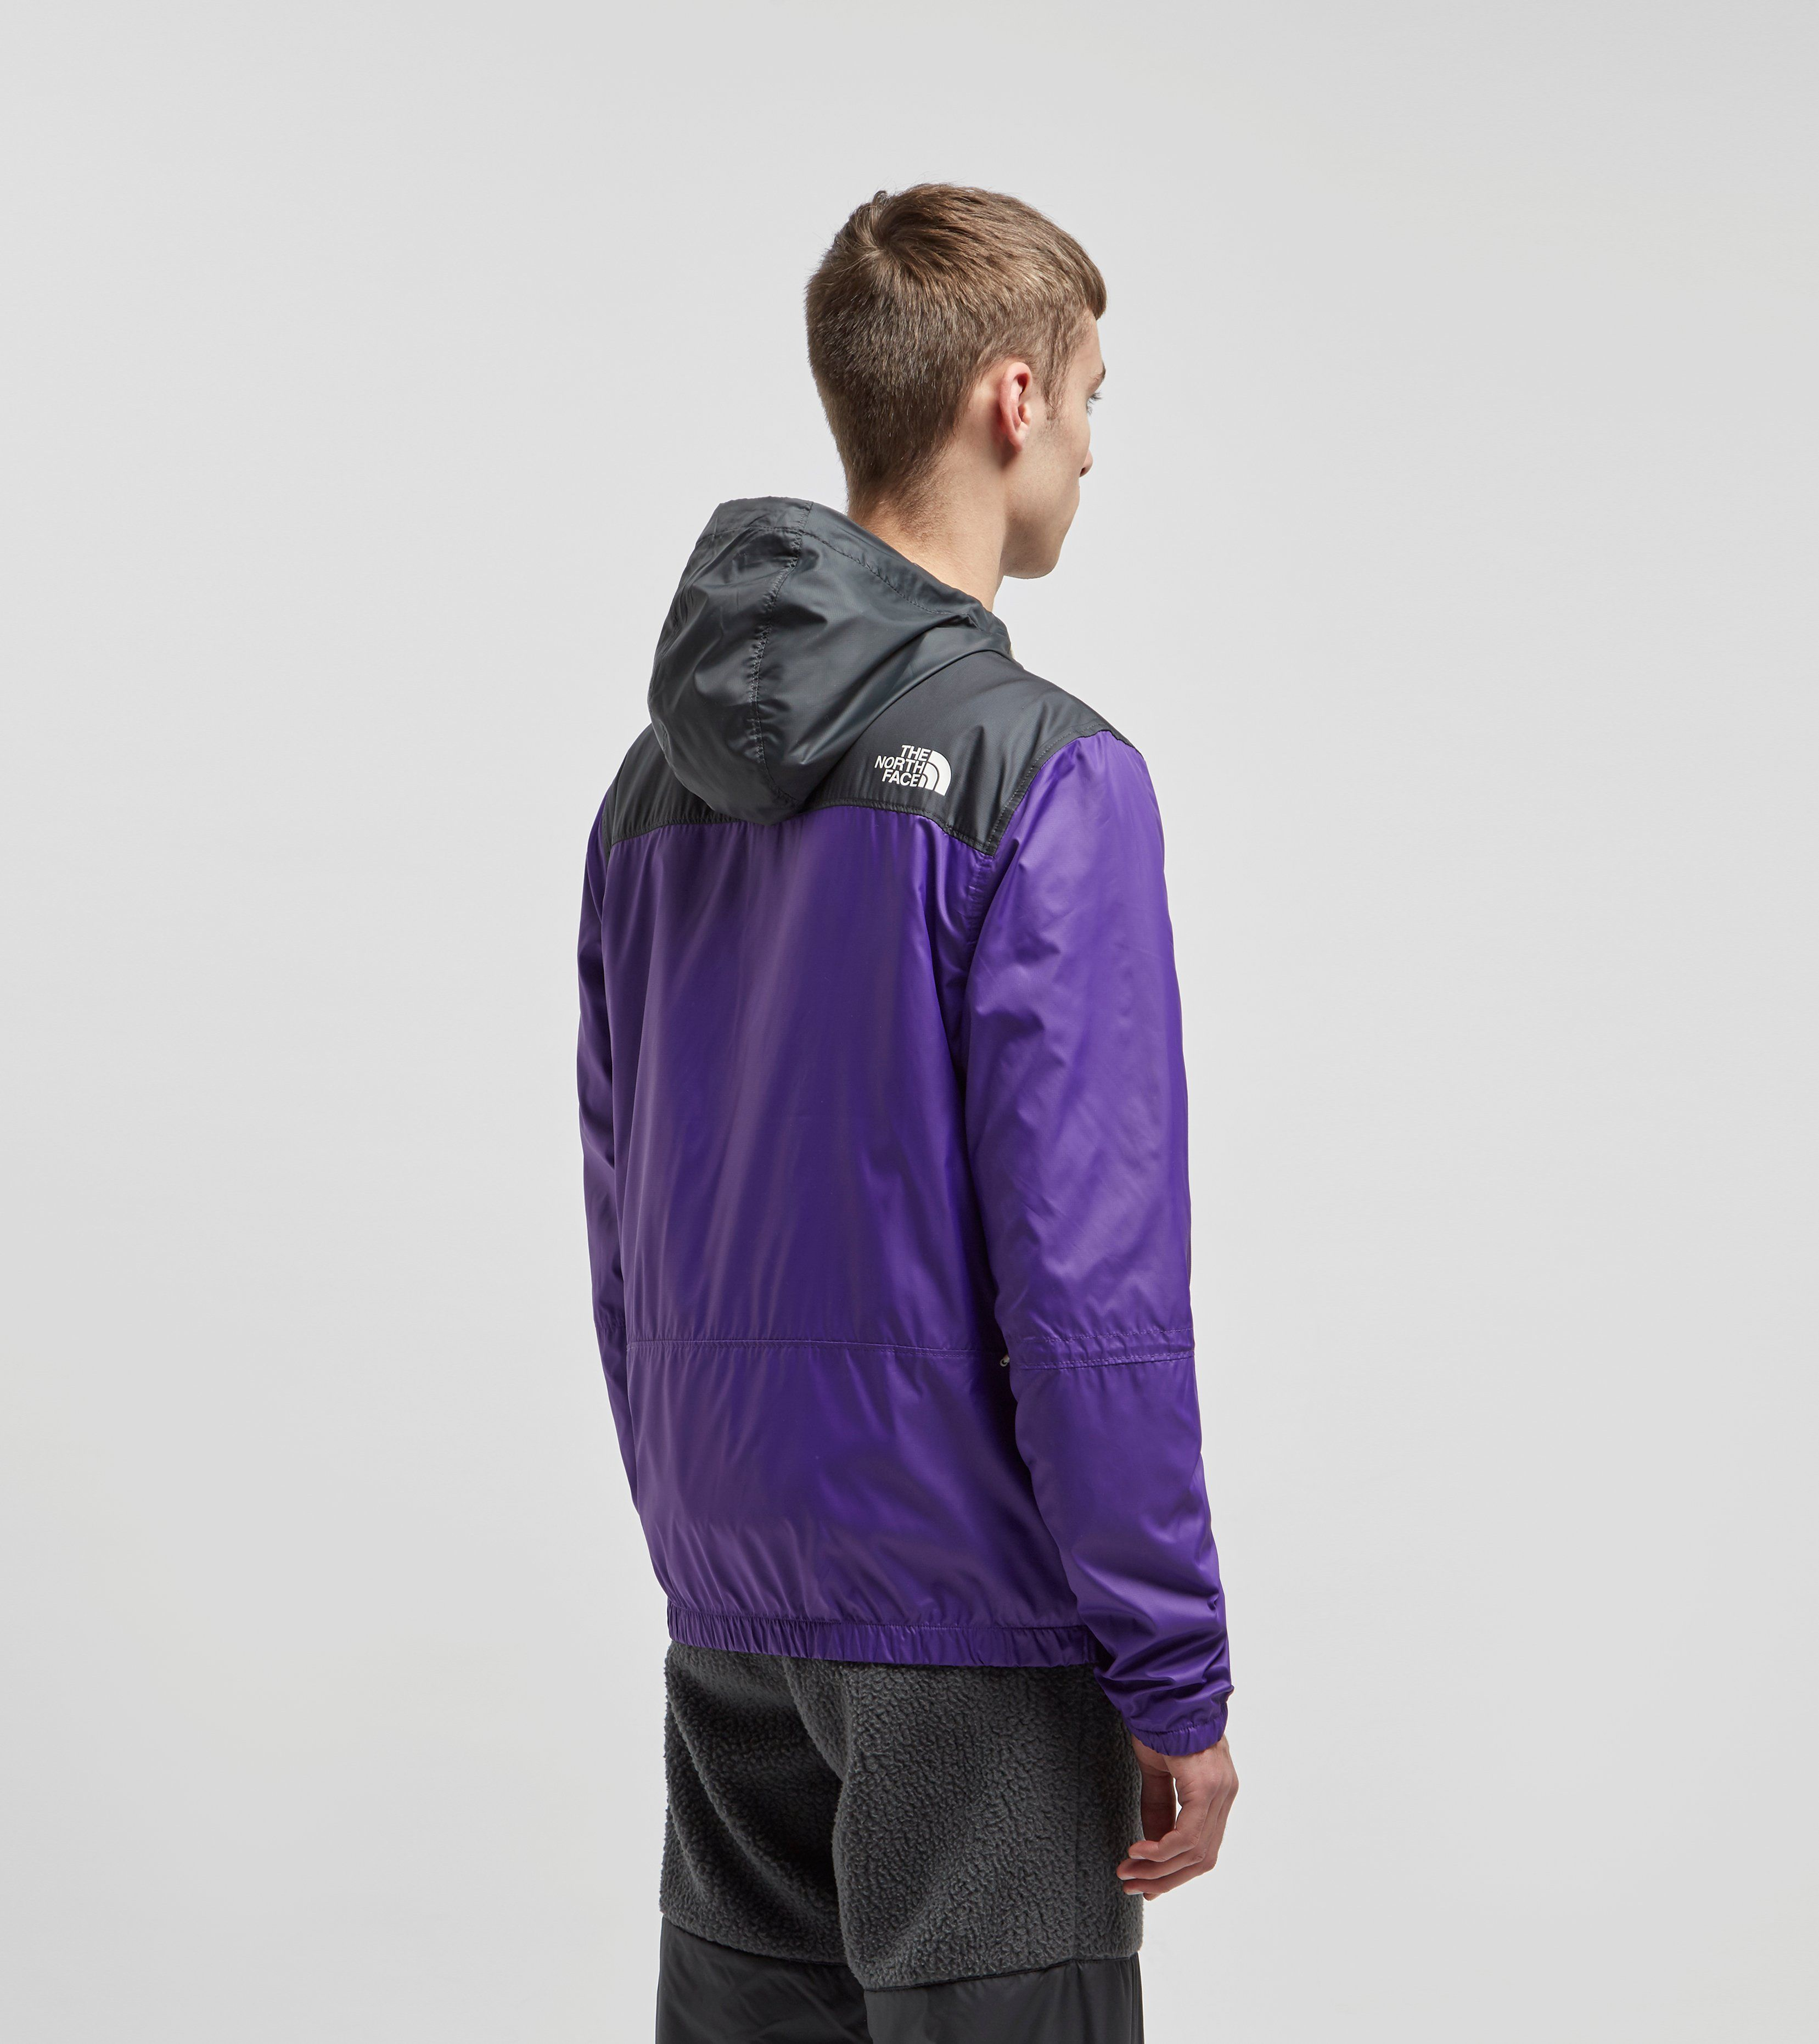 The North Face 1990 Seasonal Mountain Jacket